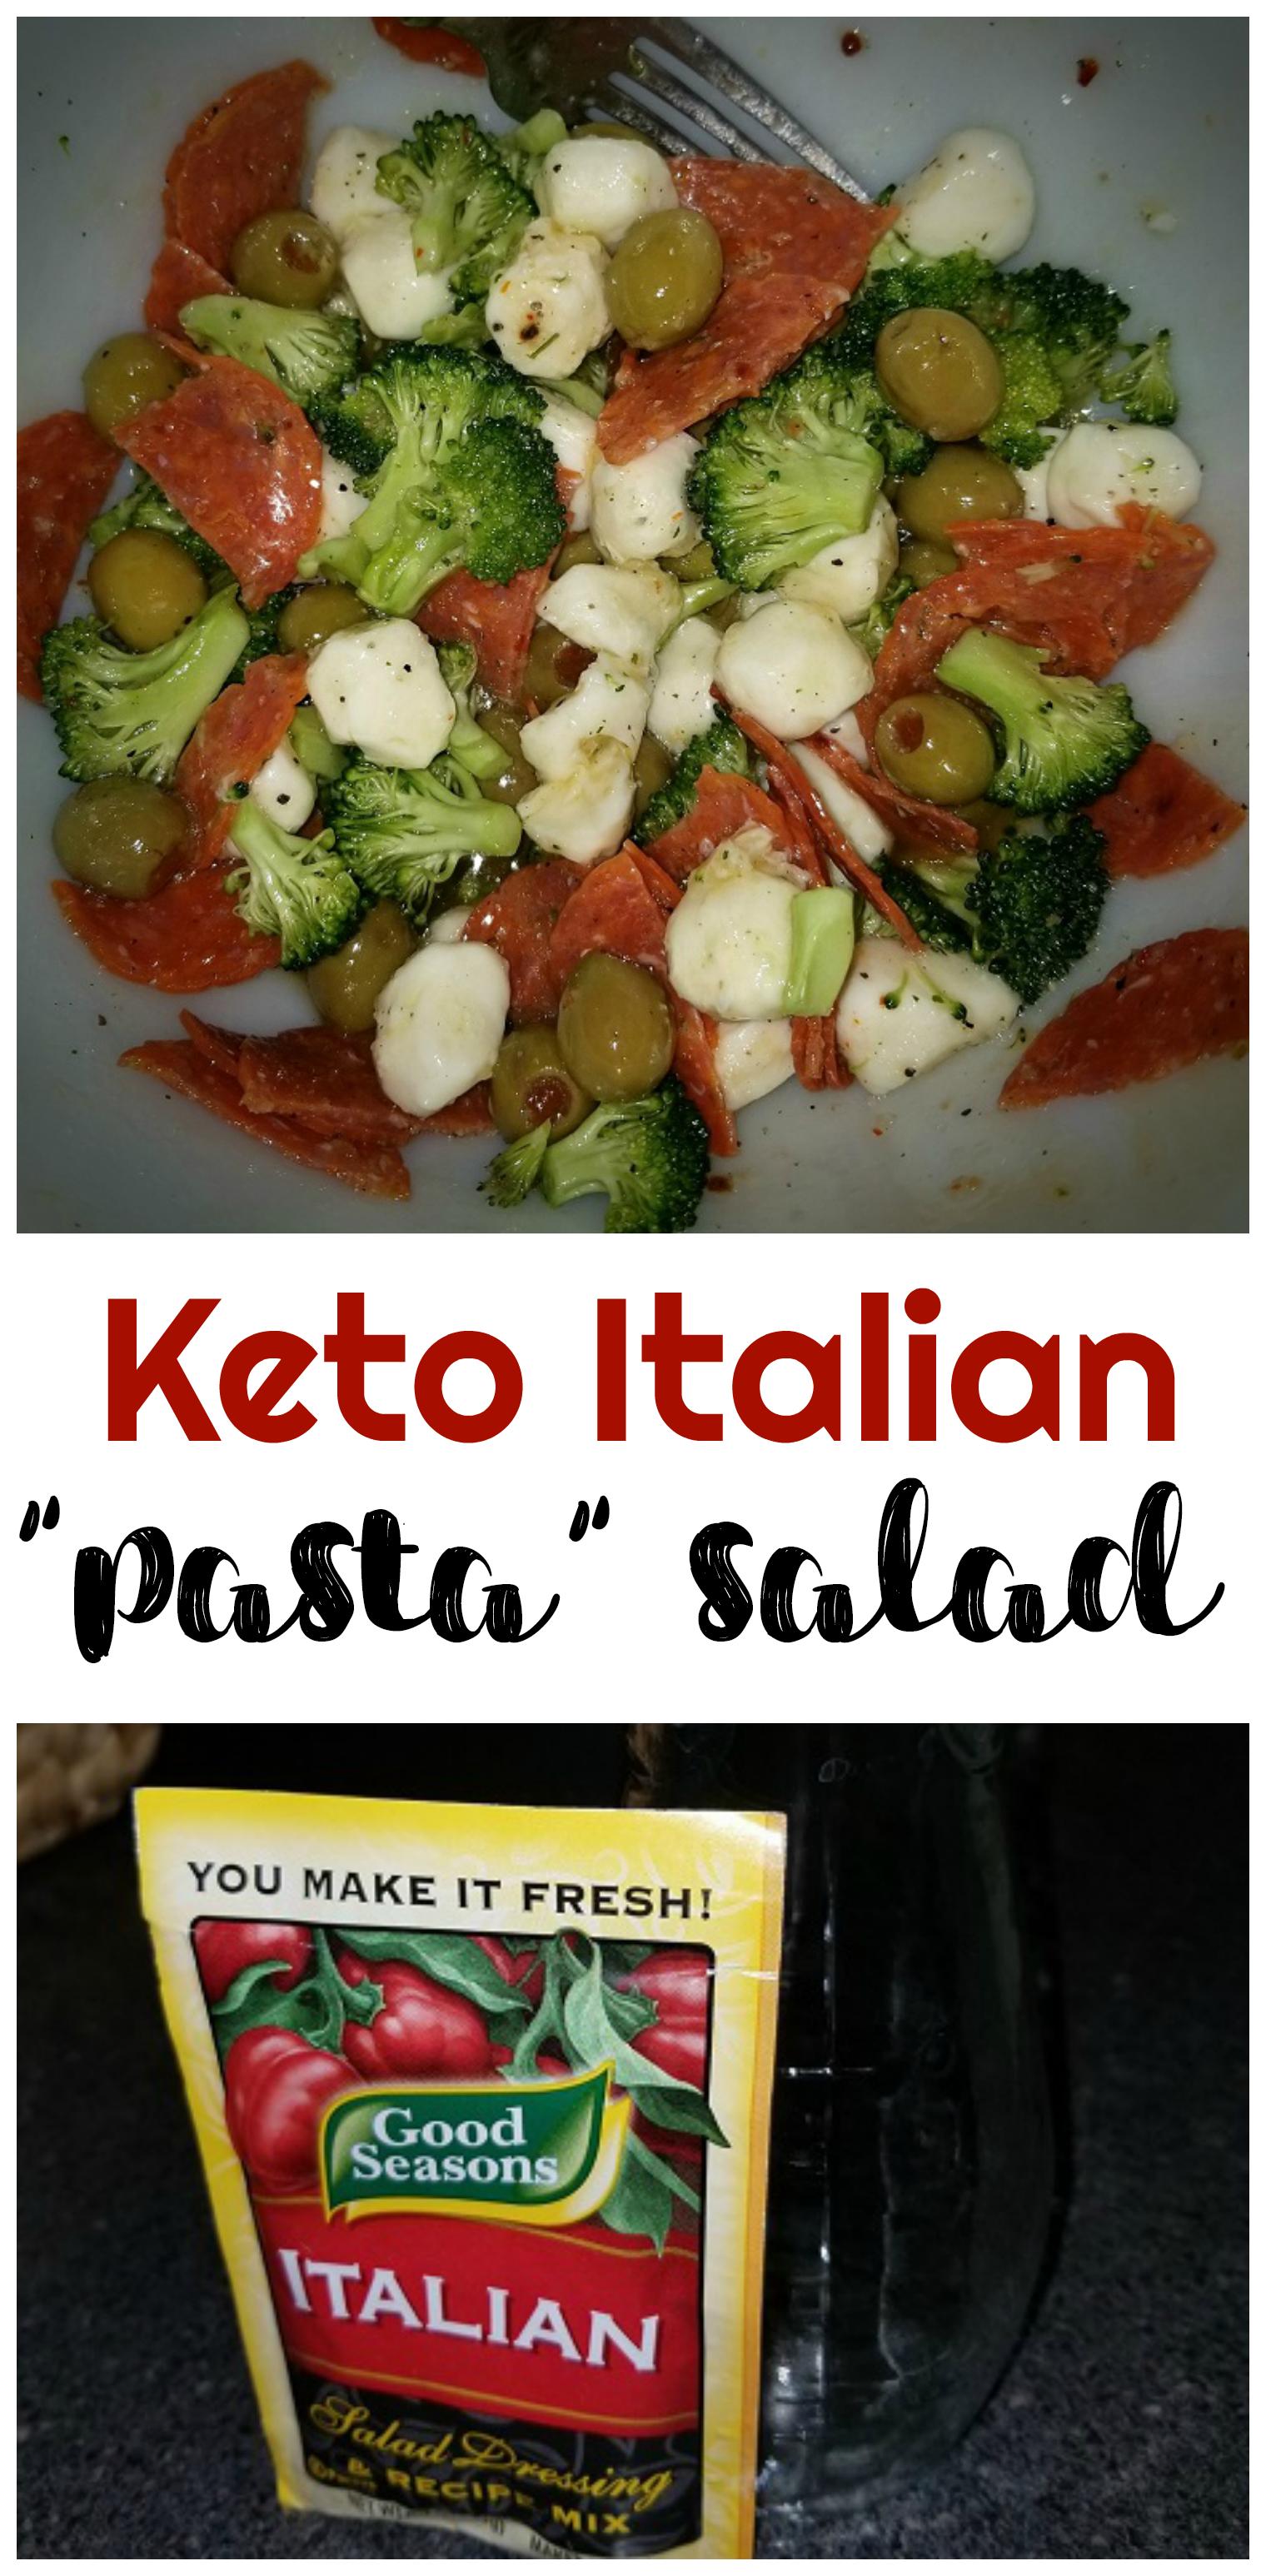 Keto No Pasta - Italian Pasta Salad - Crafty Morning